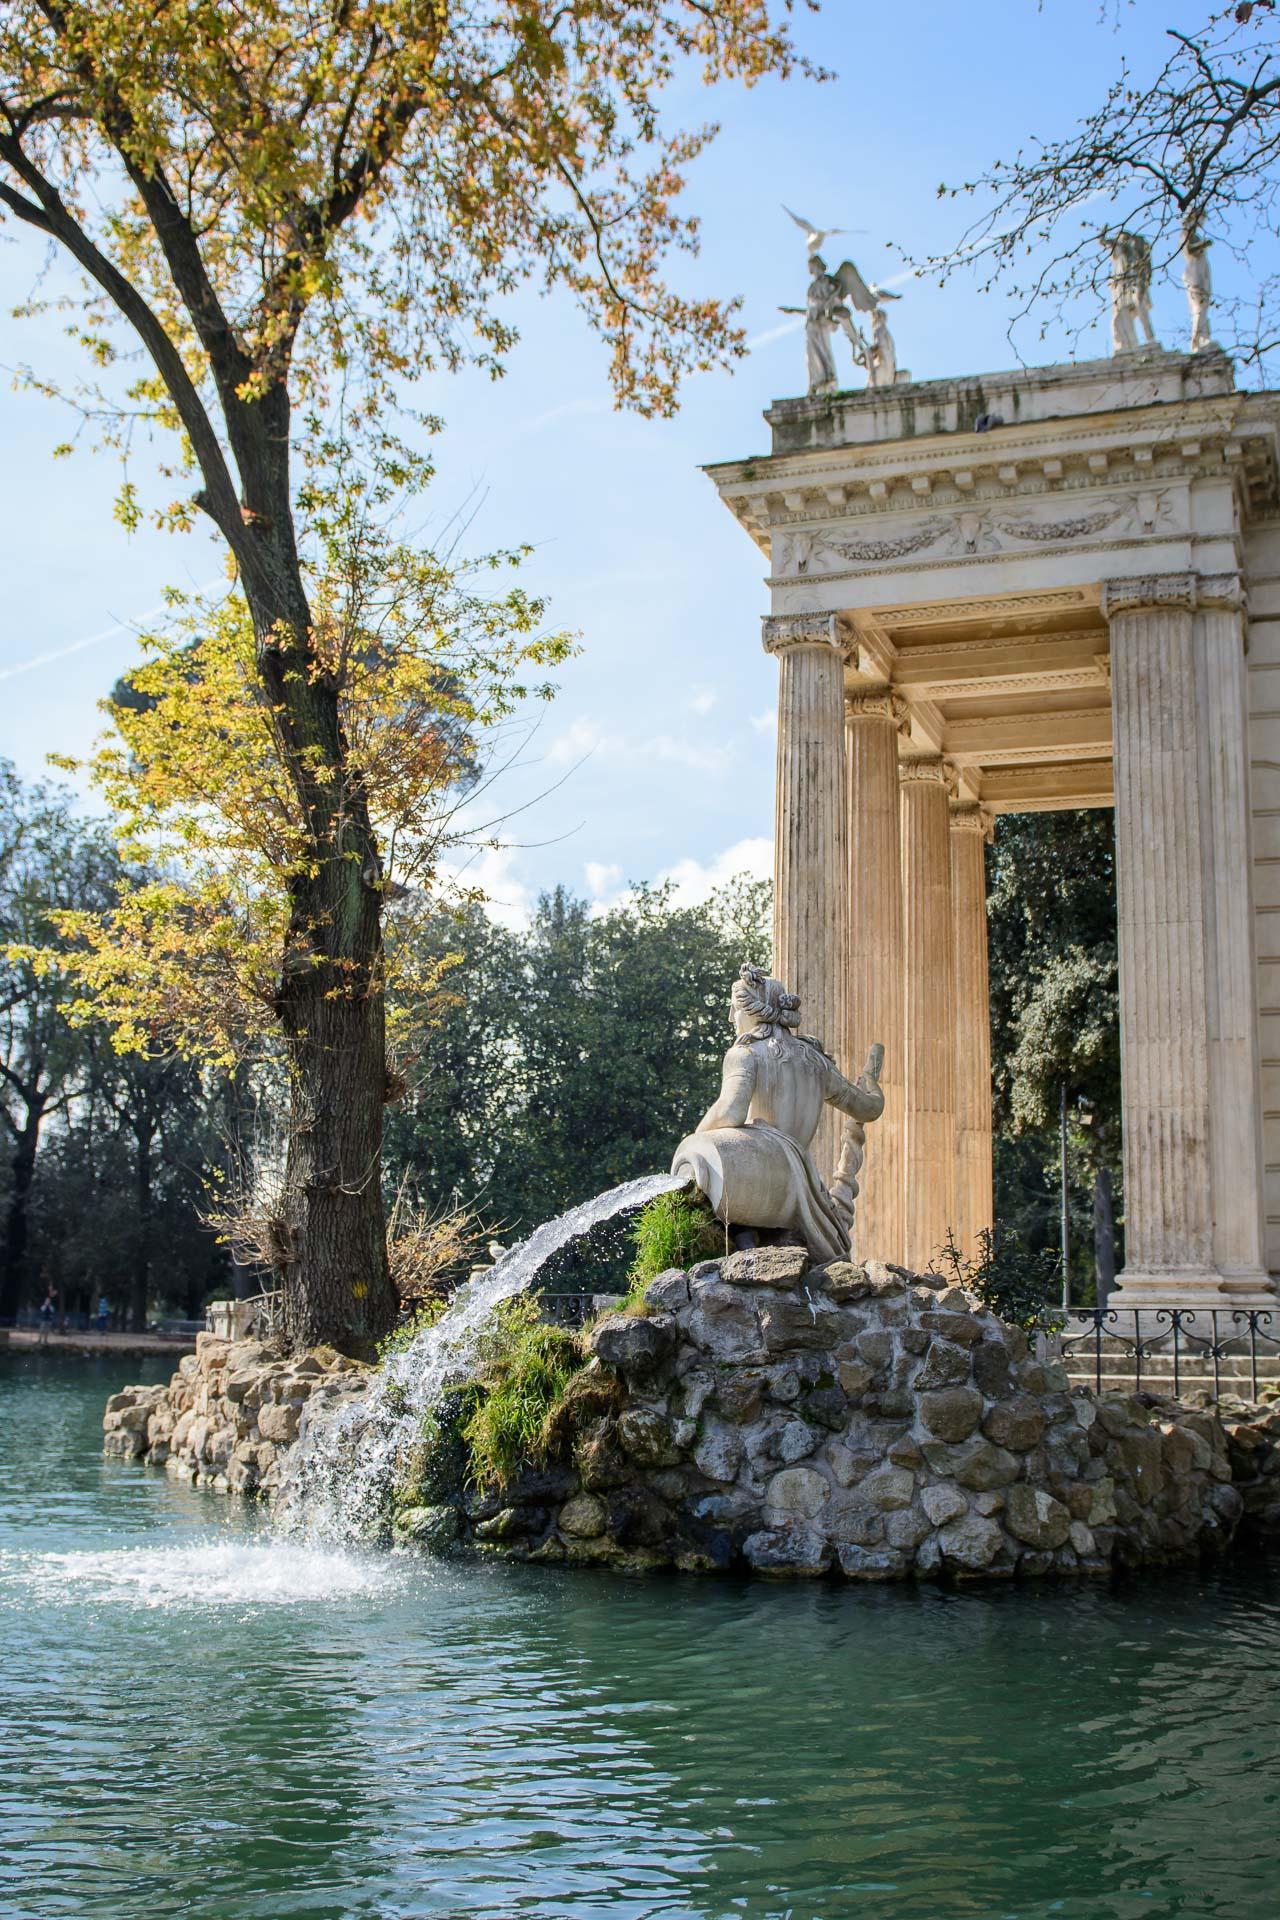 Villa Borghese Park Lake Boat Hire